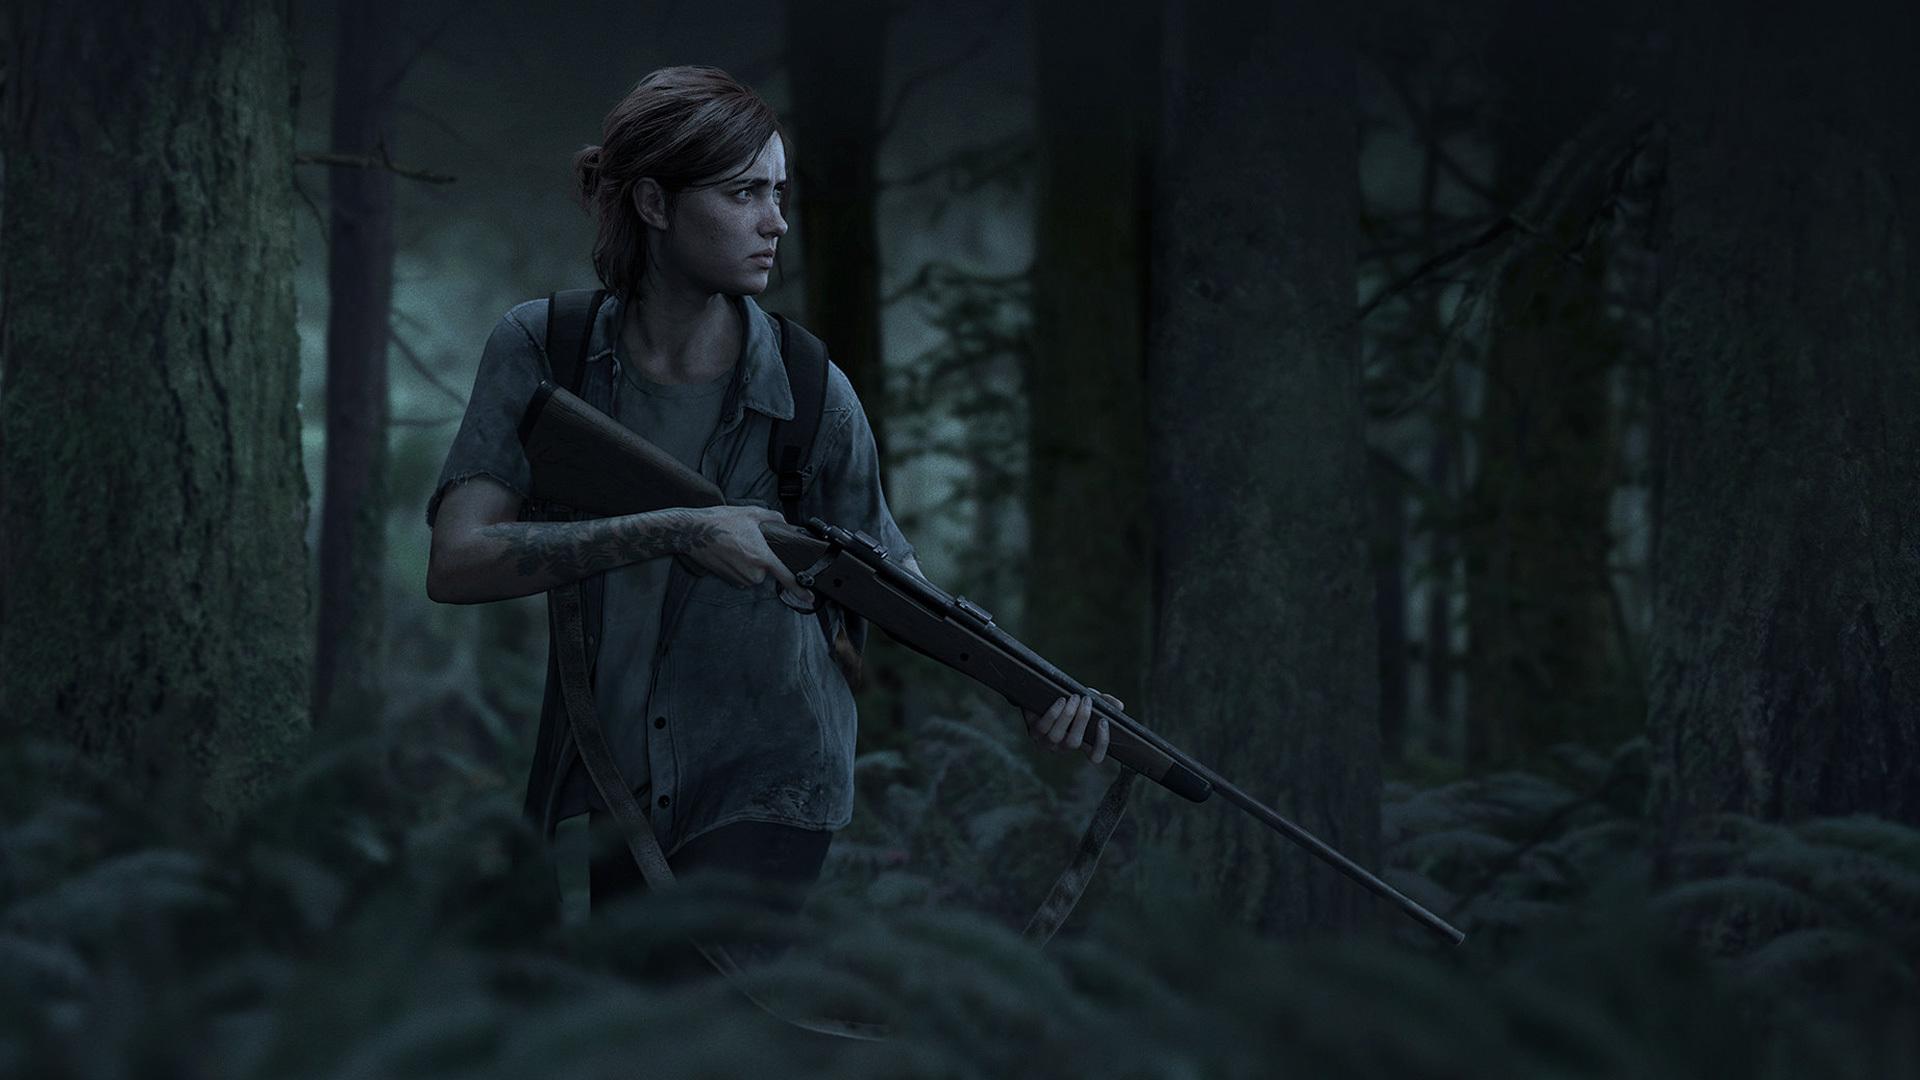 Kolla in gameplay från The Last of Us: Part II